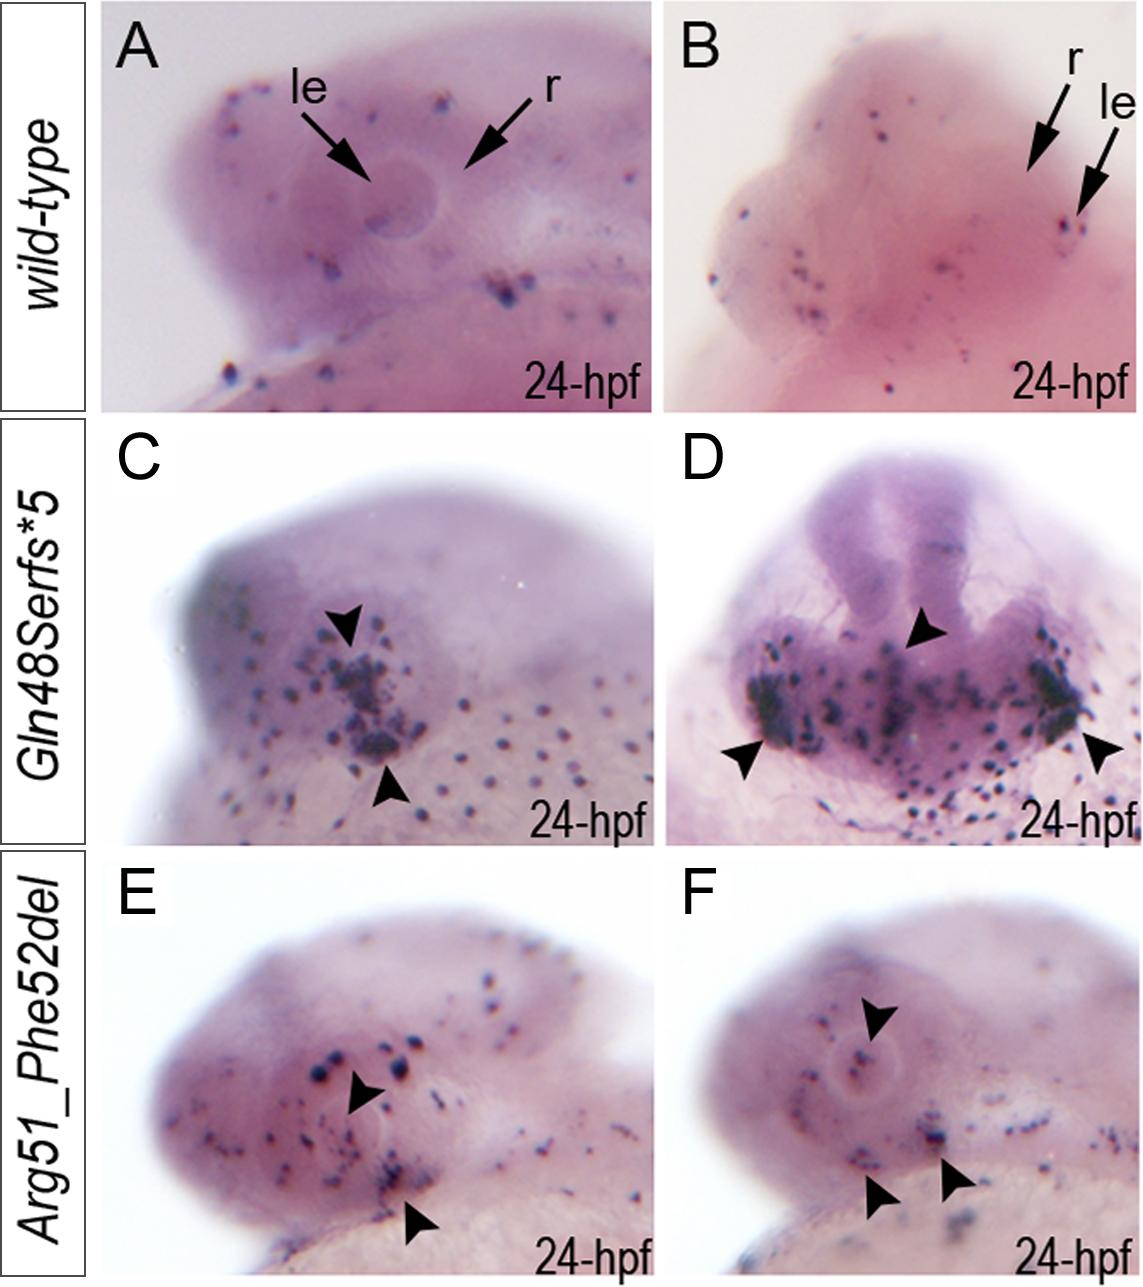 Summary of TUNEL assays in zebrafish wild-type and <i>mab21l2</i> mutant embryos.